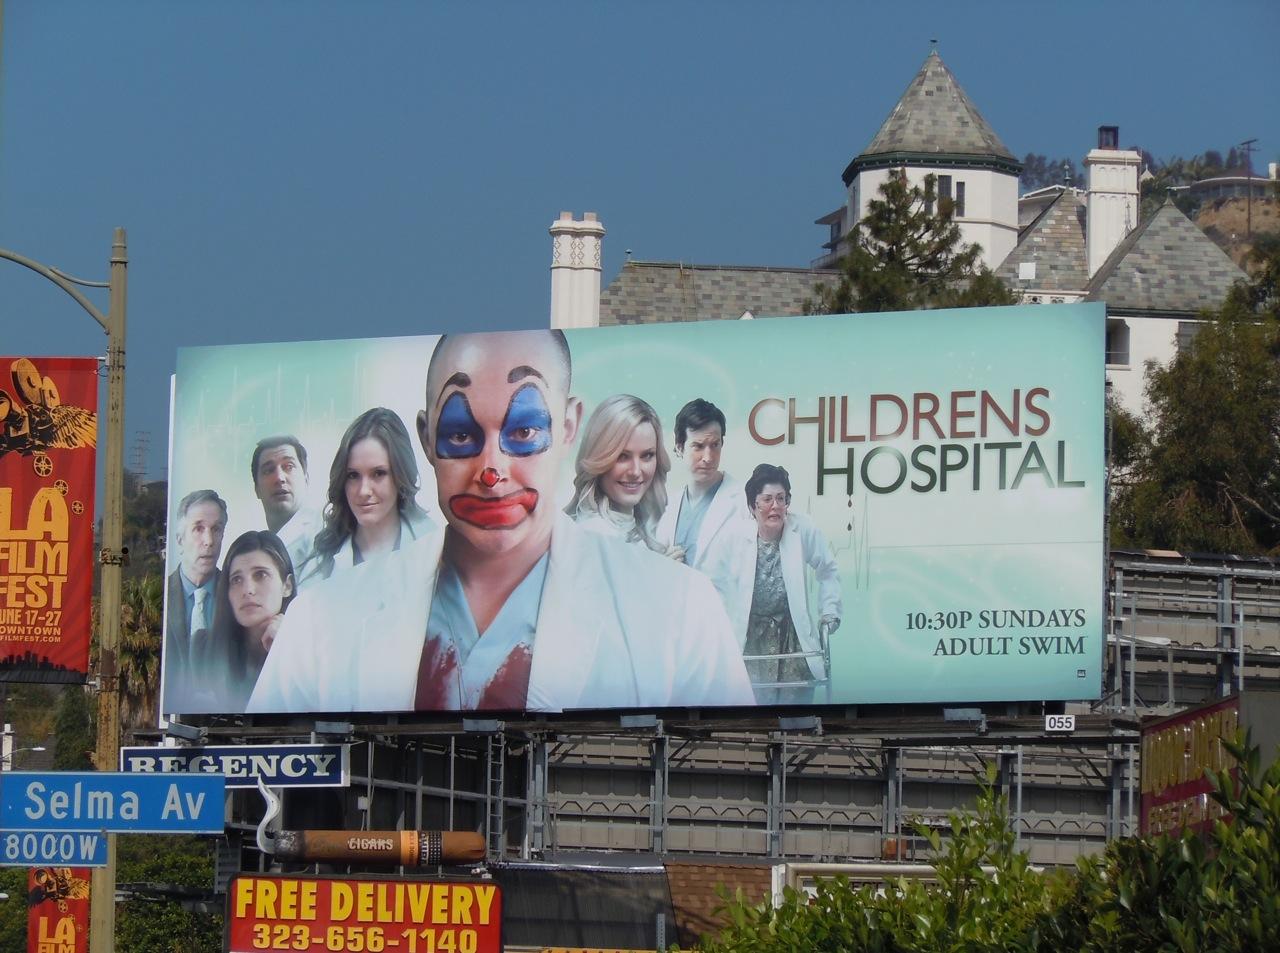 Childrens%2BHospital%2Badult%2Bswim%2Bbillboard Stank O Meter star Tiffani Amber Thiessens Big Belly Is Pregnant As Hell ...